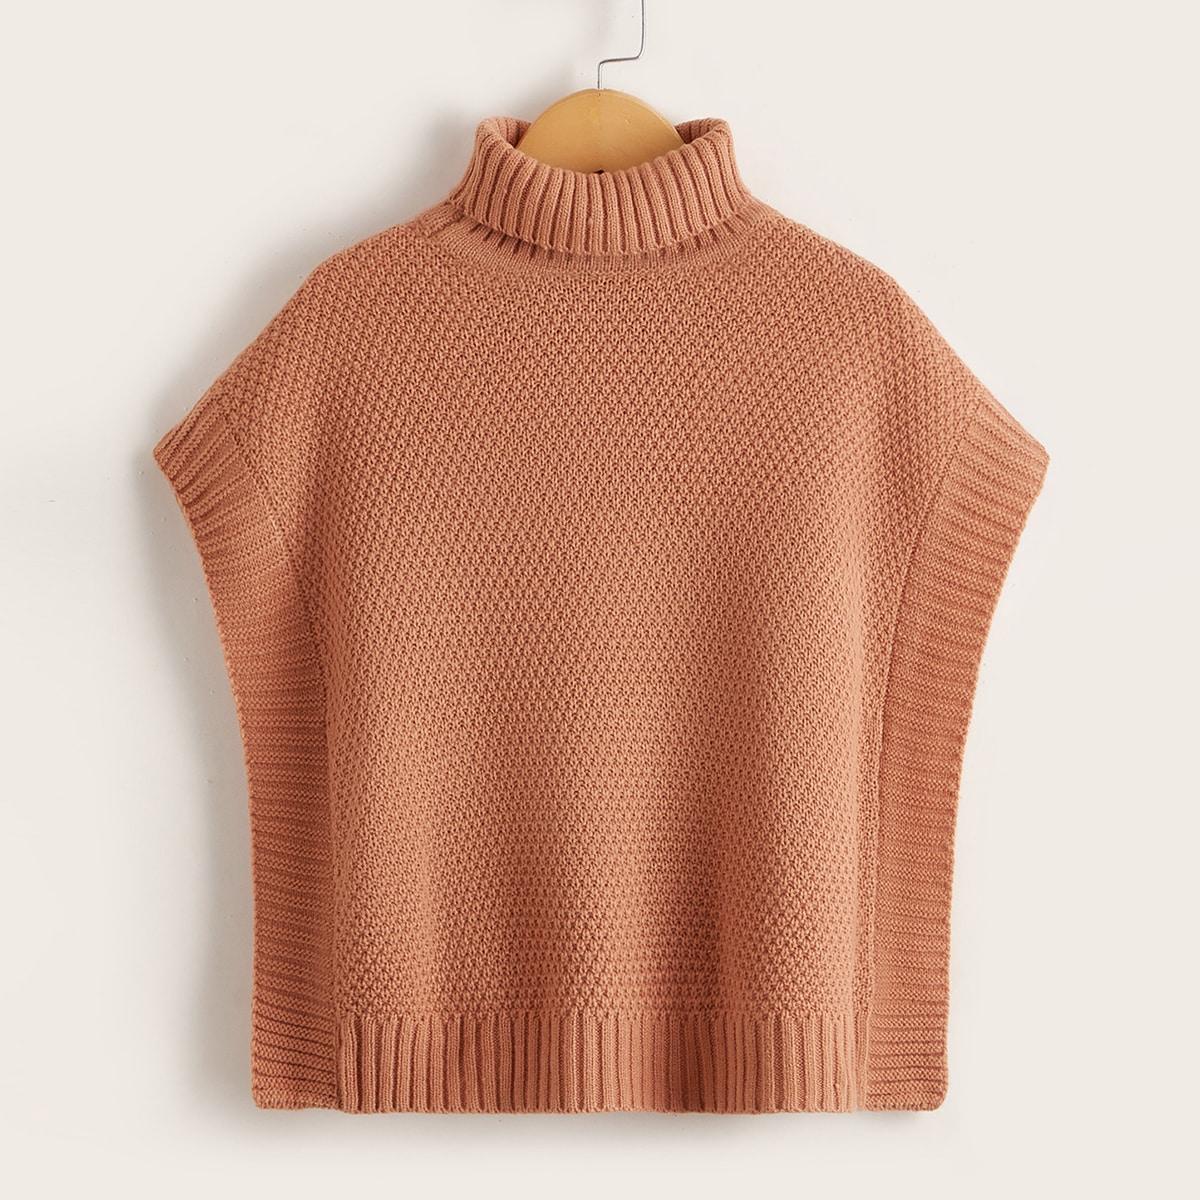 Girls Solid Turtleneck Batwing Sleeve Sweater Vest